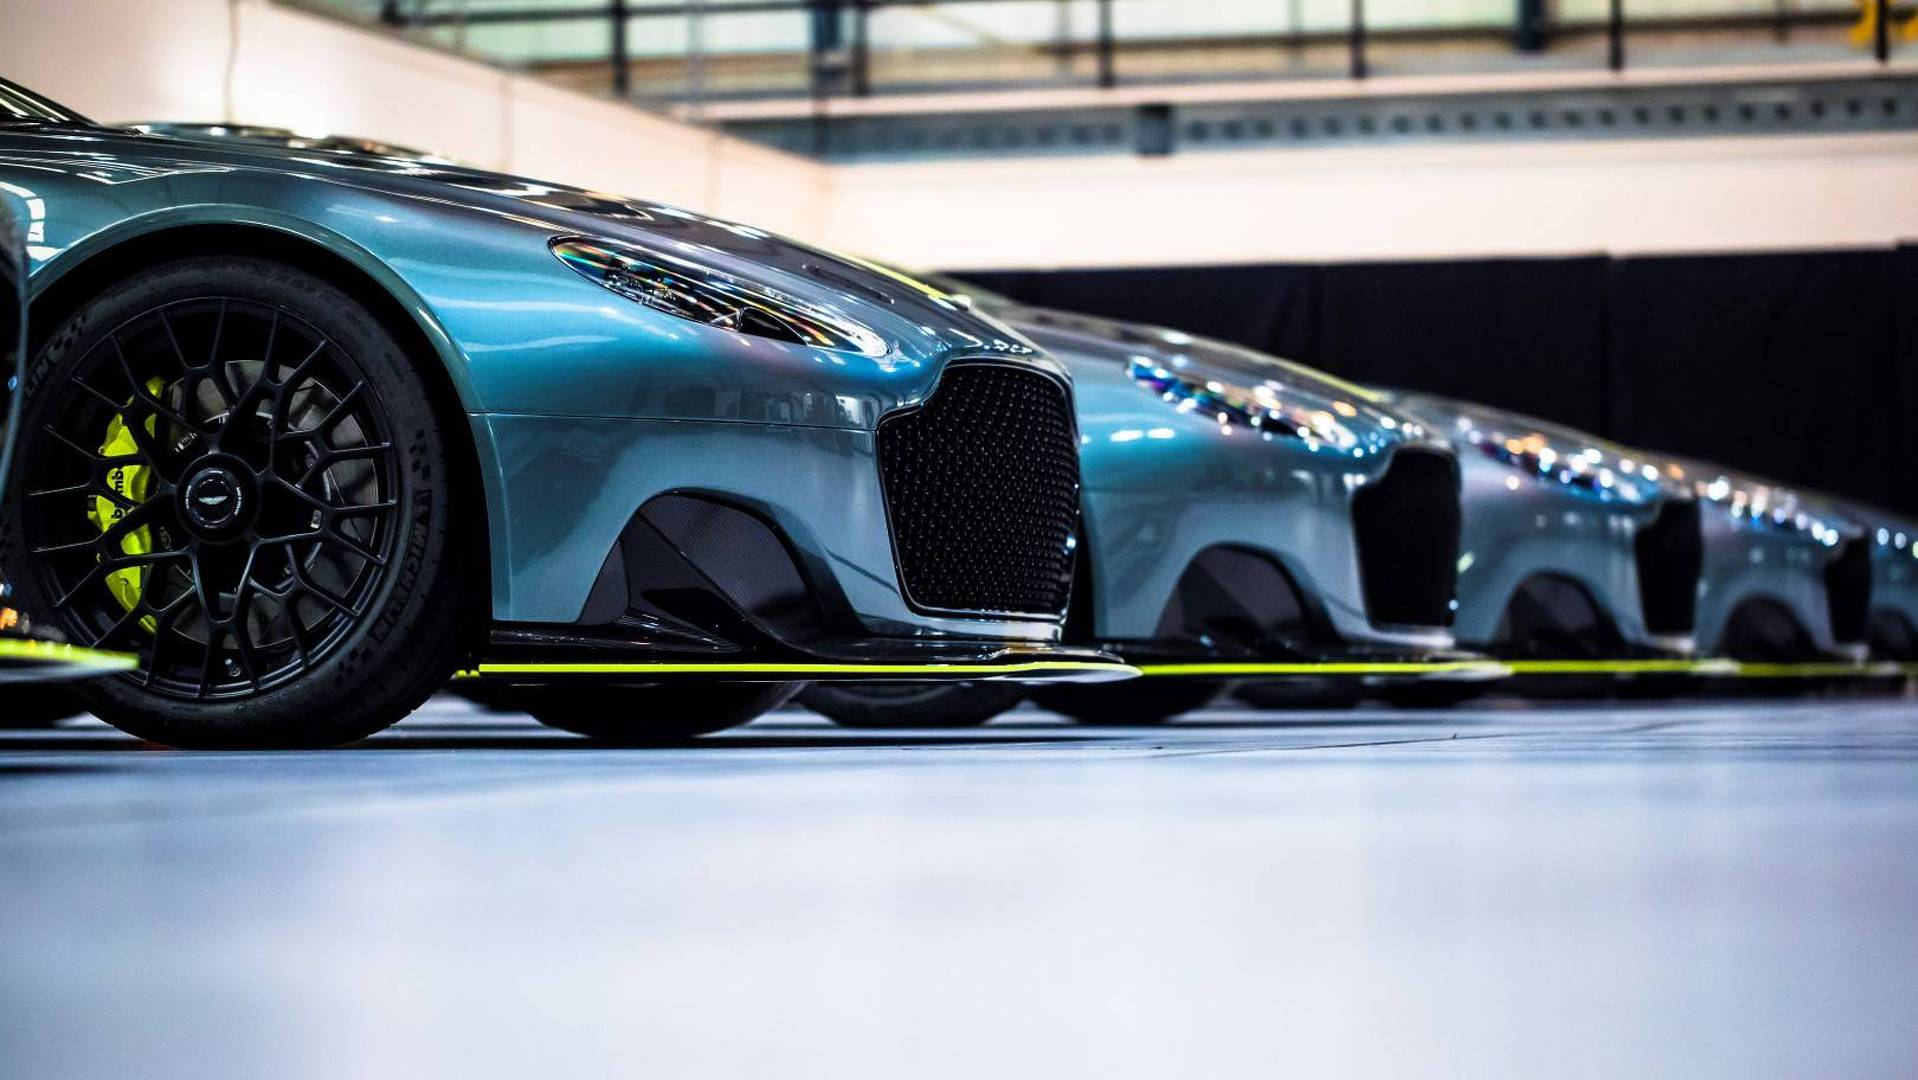 These Seven Unique Vantage Amr Pros Are Aston Martin Paradise